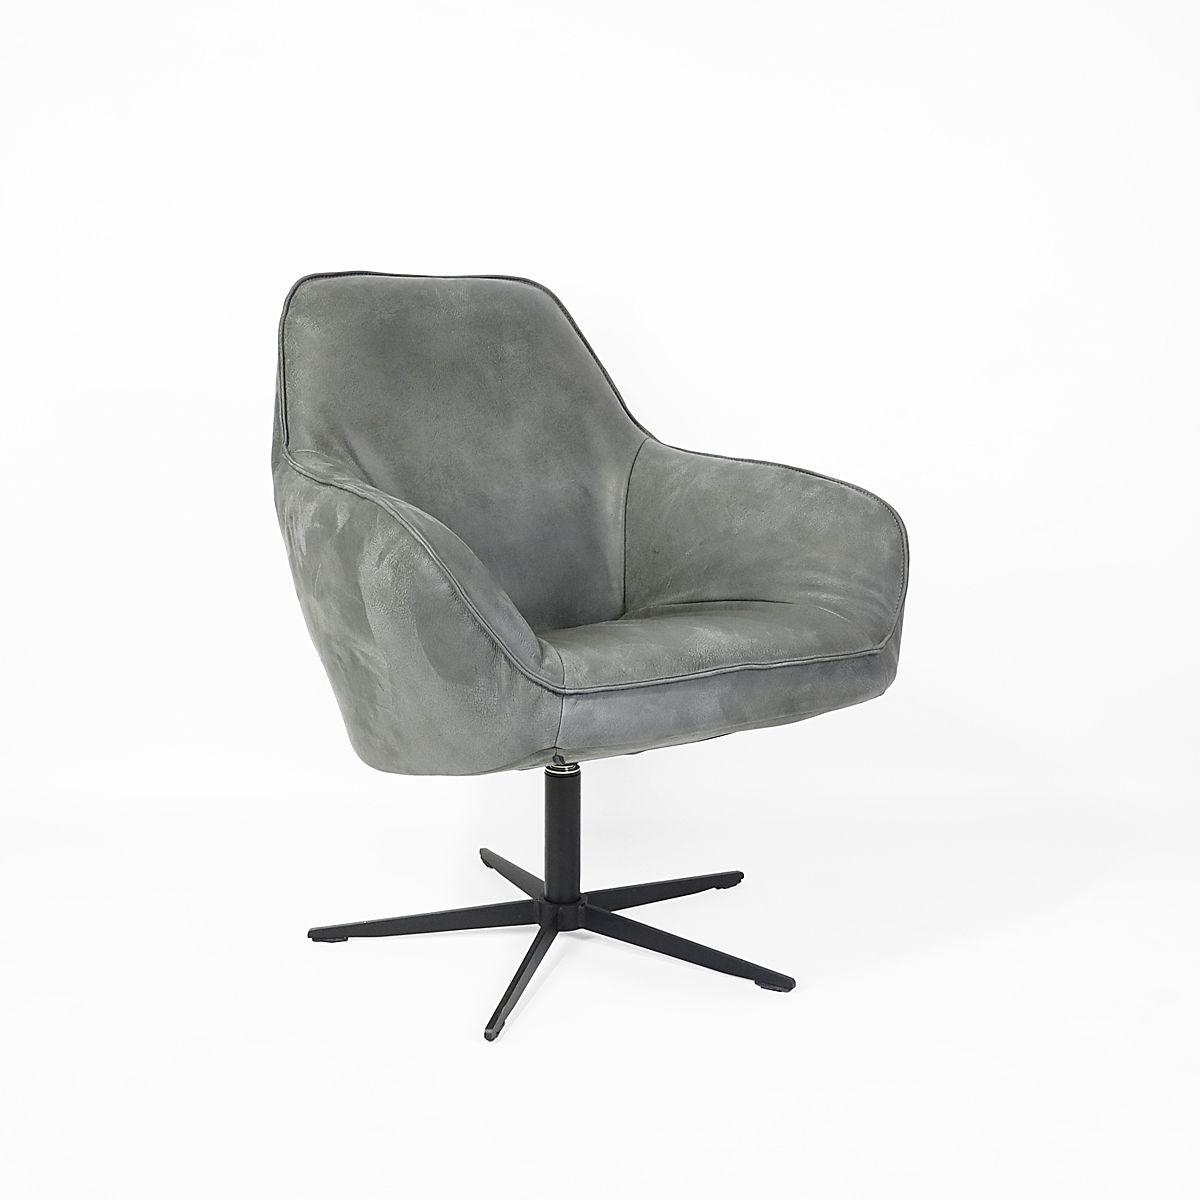 Draai fauteuil Hugo